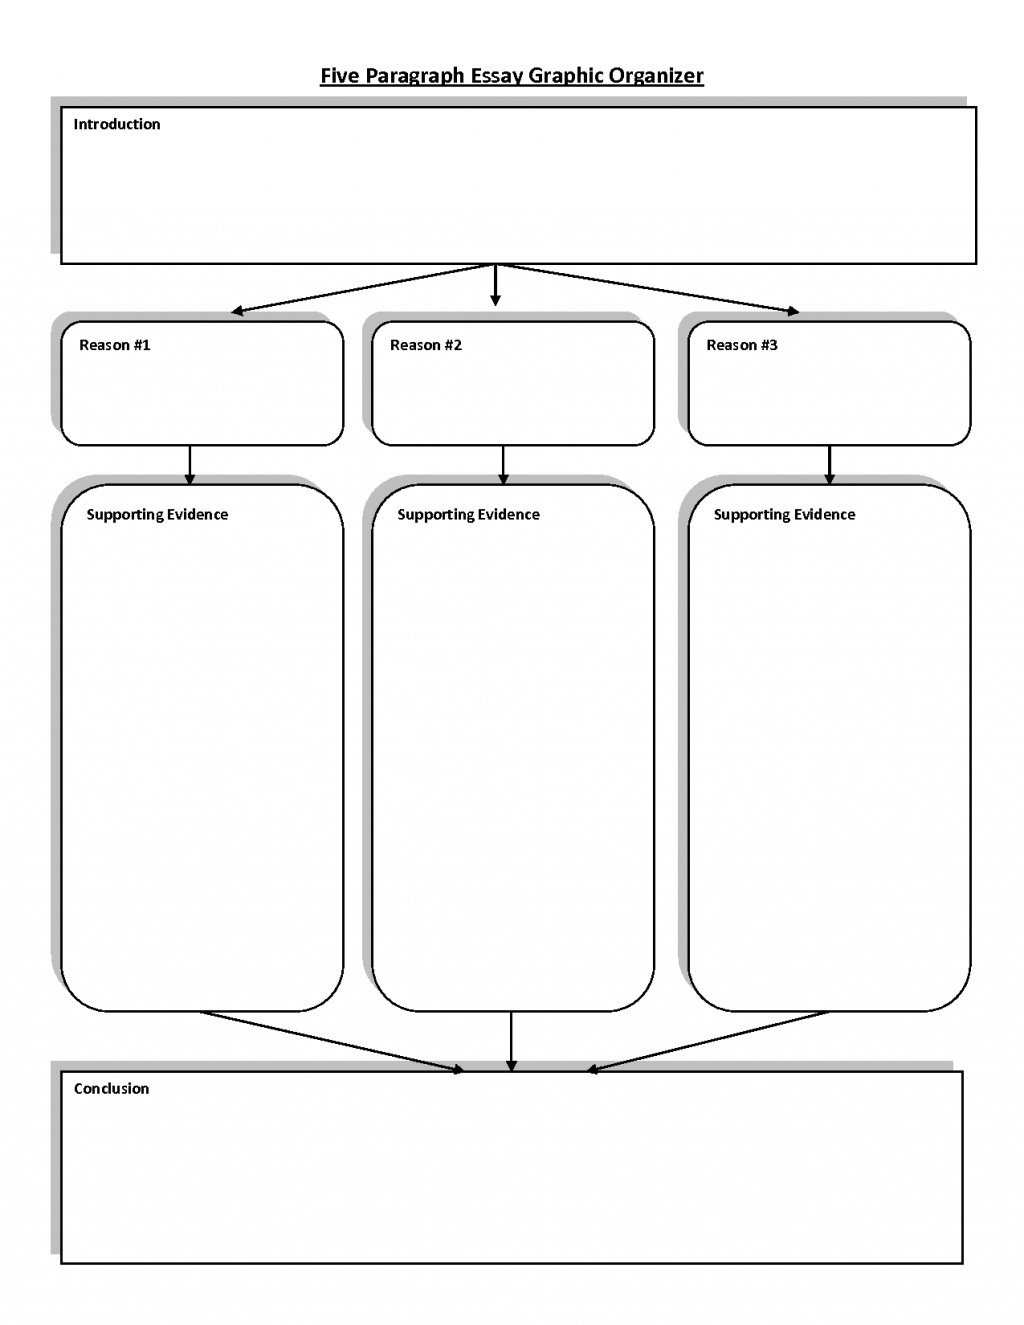 009 Argumentative Essay Graphic Organizer Pdf Para Impressive Persuasive Middle School Large